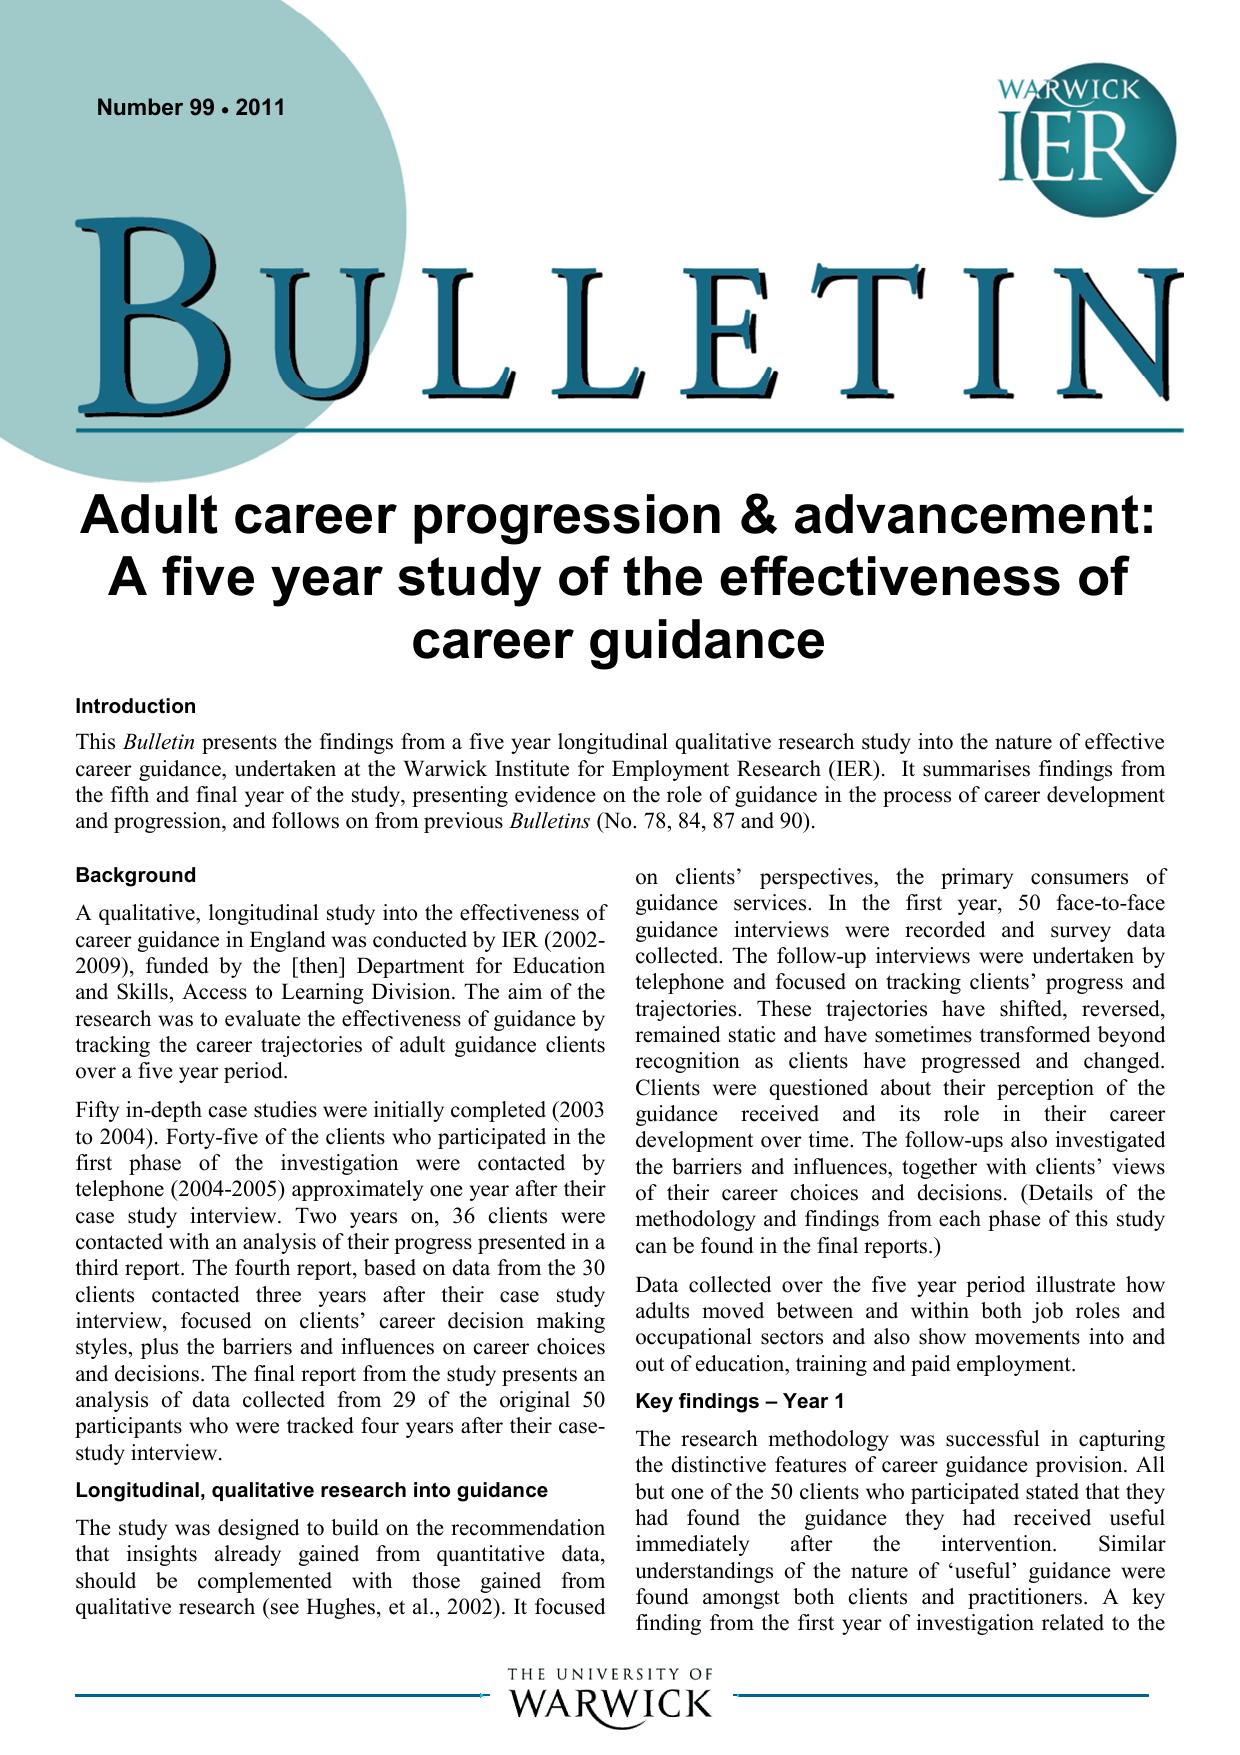 Adult career guidance galleries 843